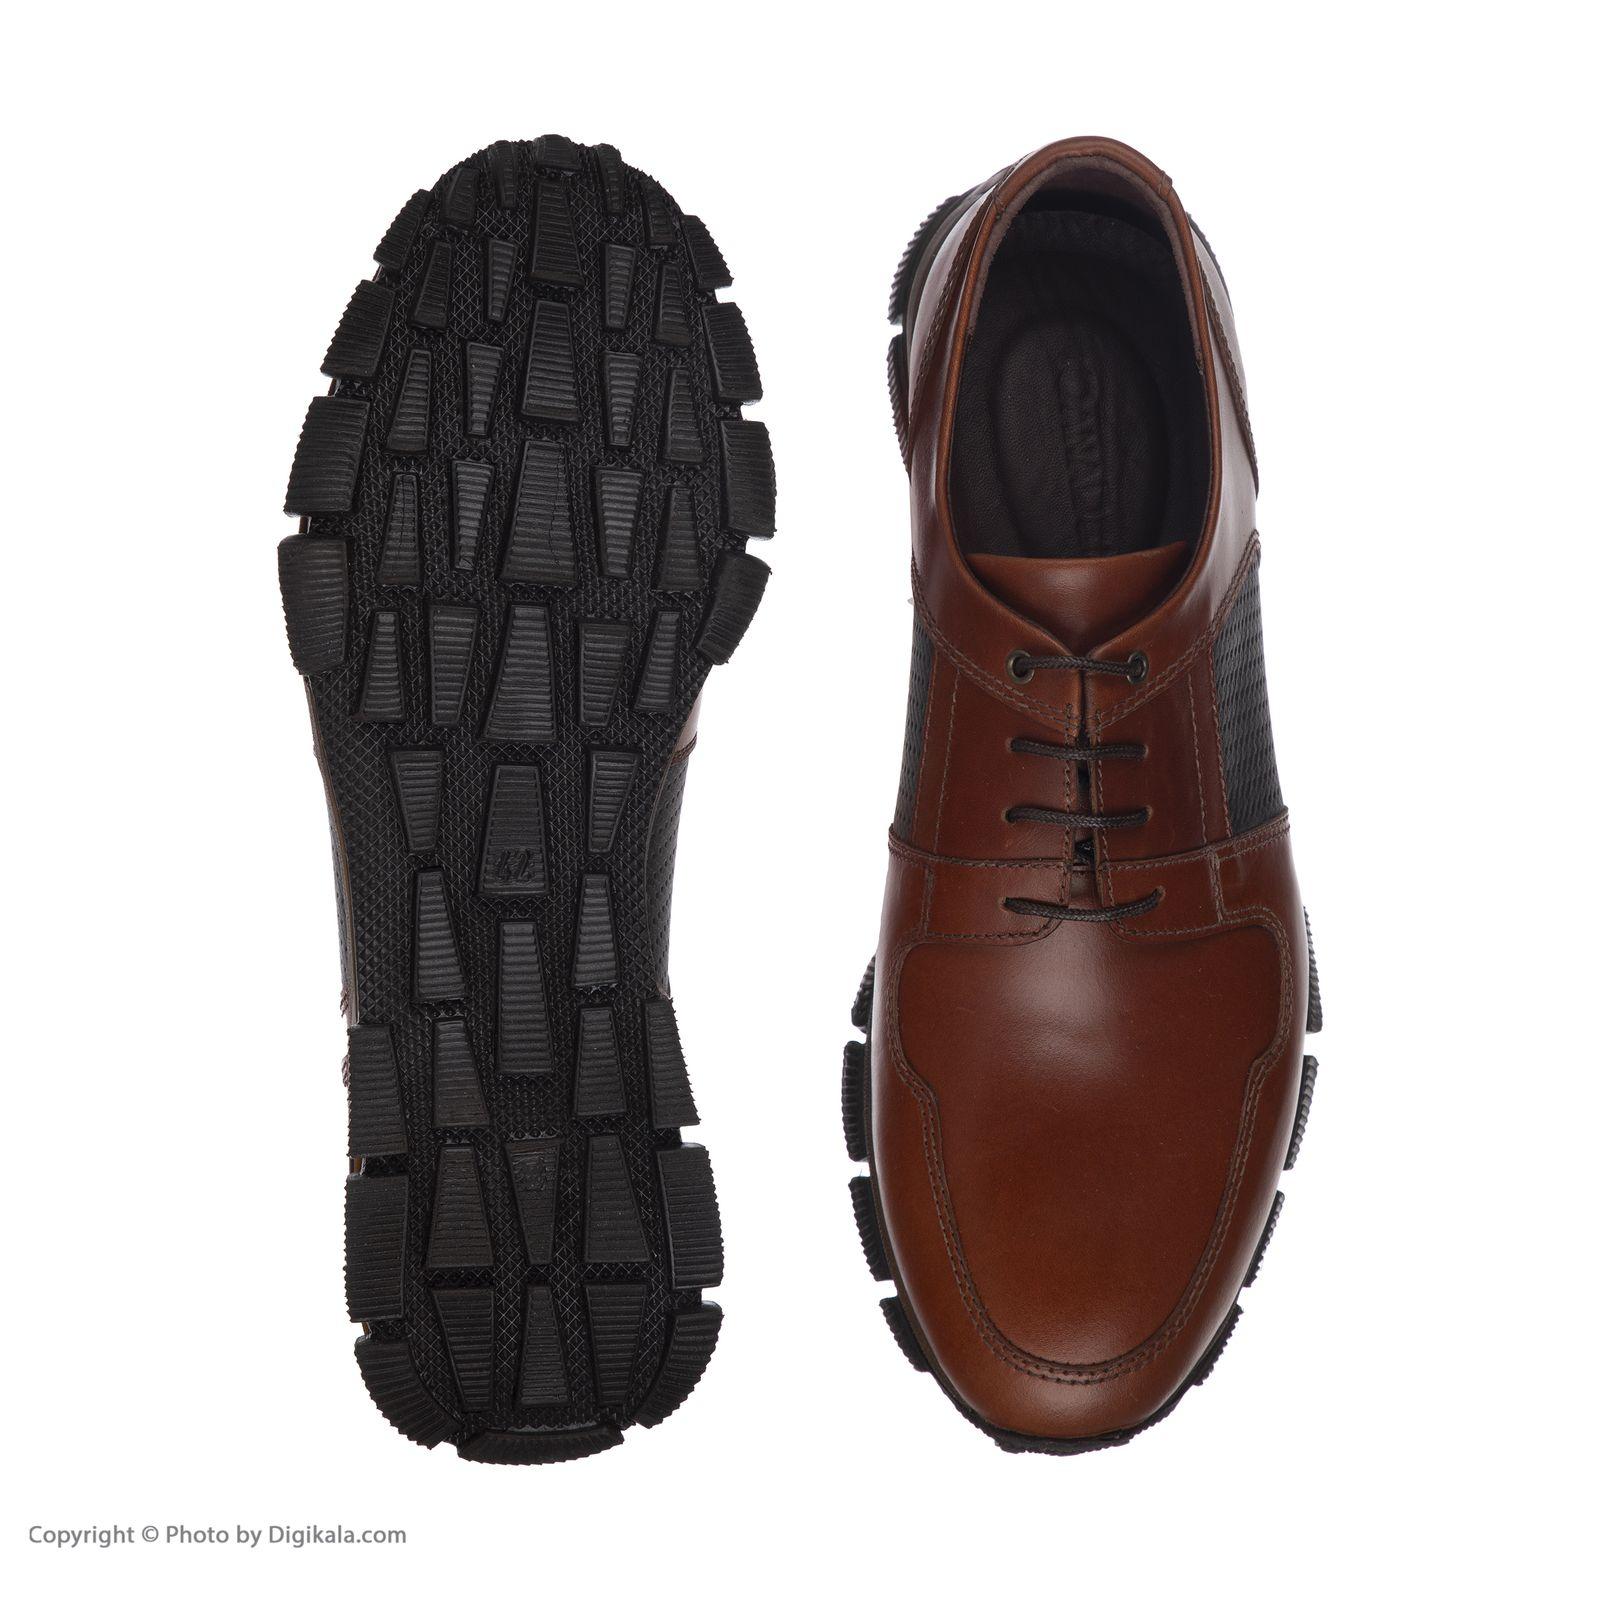 کفش روزمره مردانه دانادل مدل 8604B503136 -  - 3